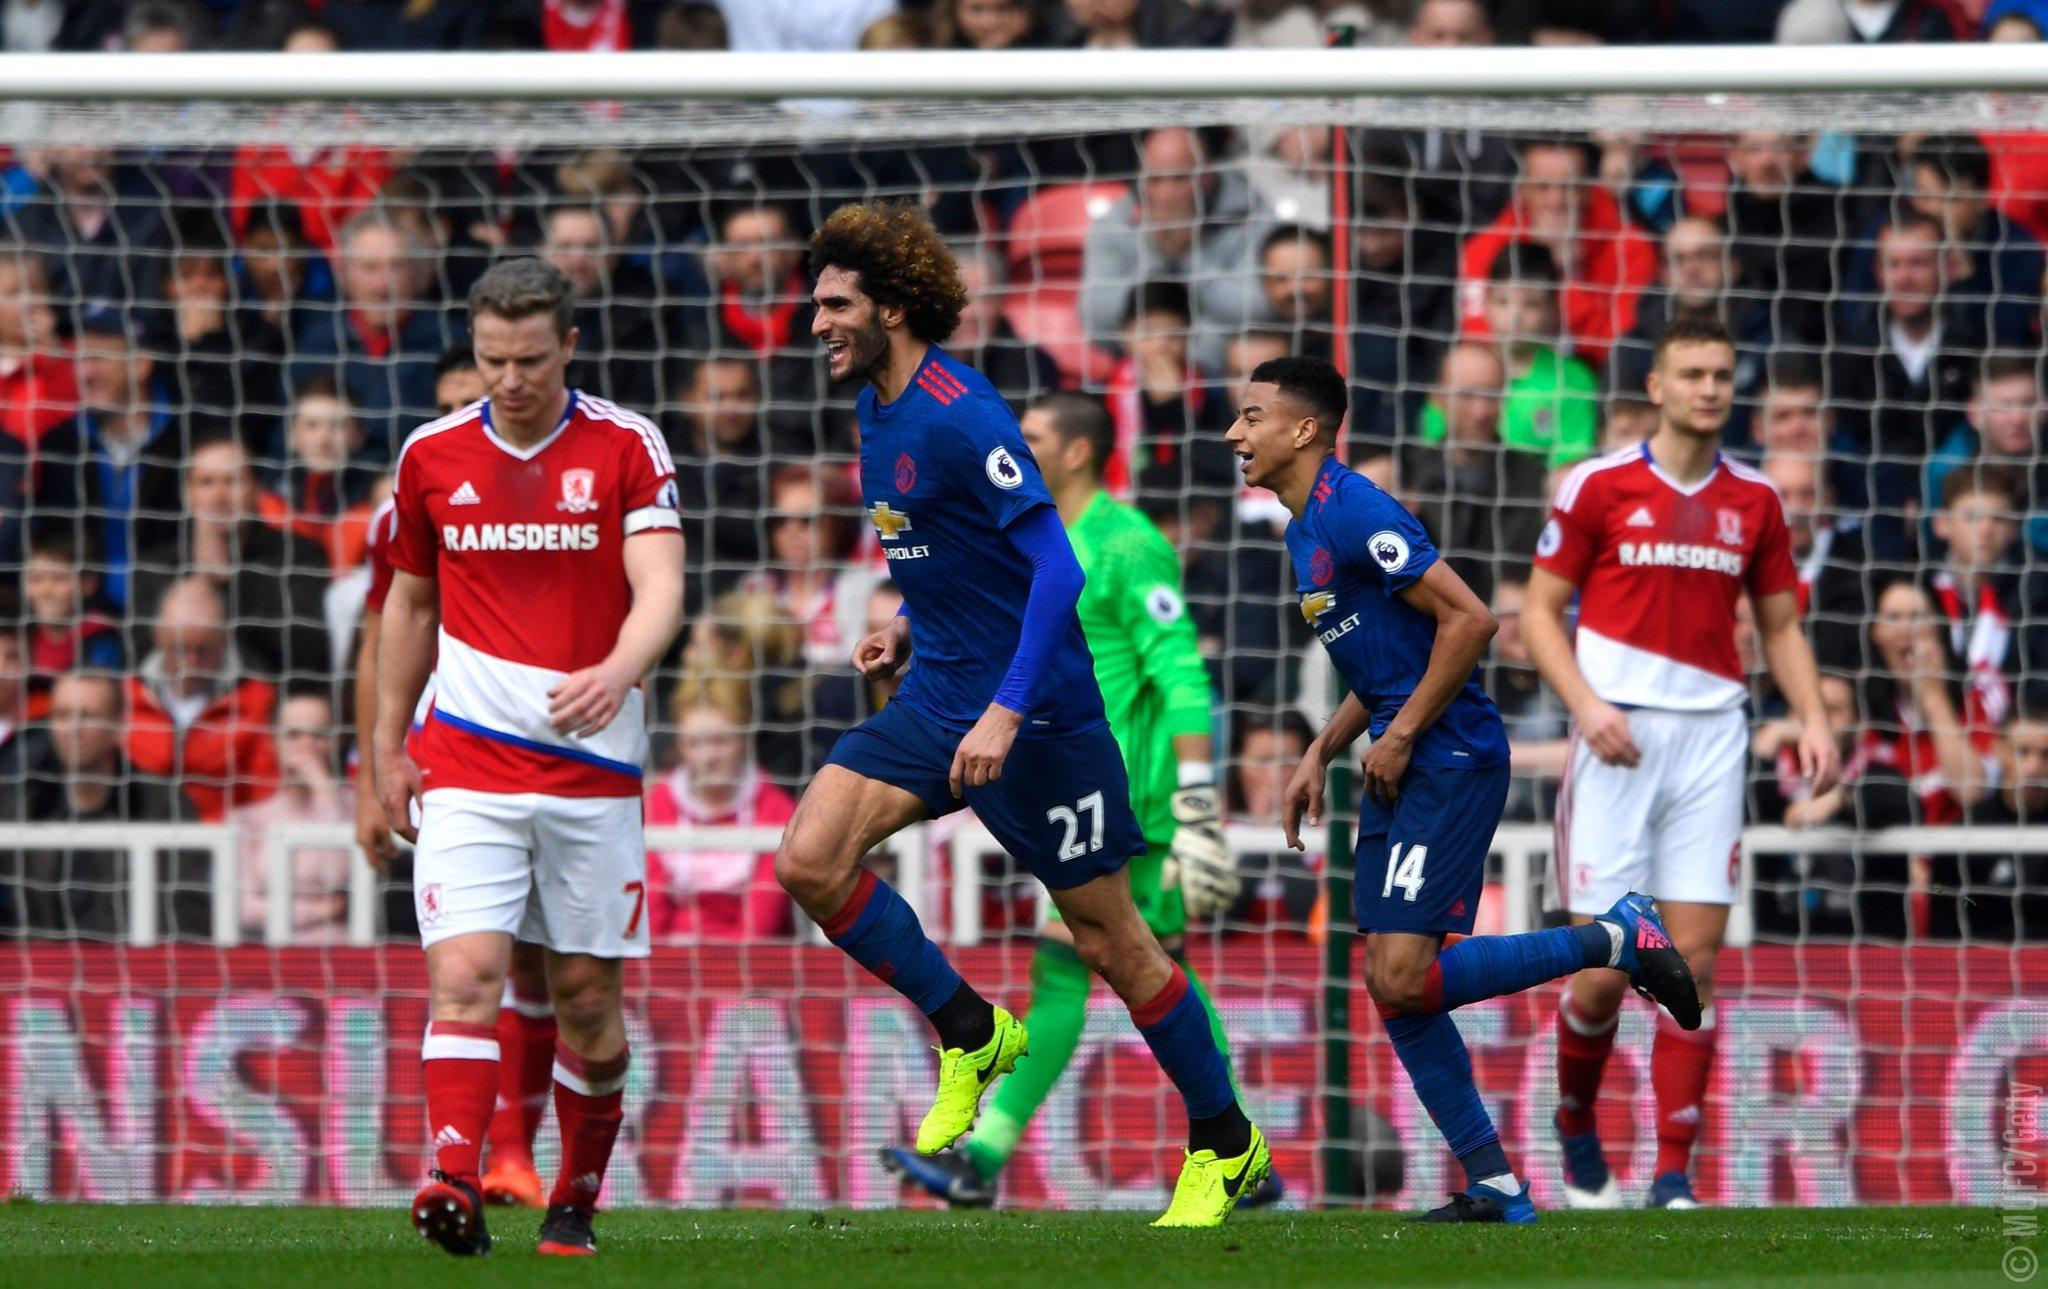 Man United Outsmart Stubborn Boro To Go Fifth